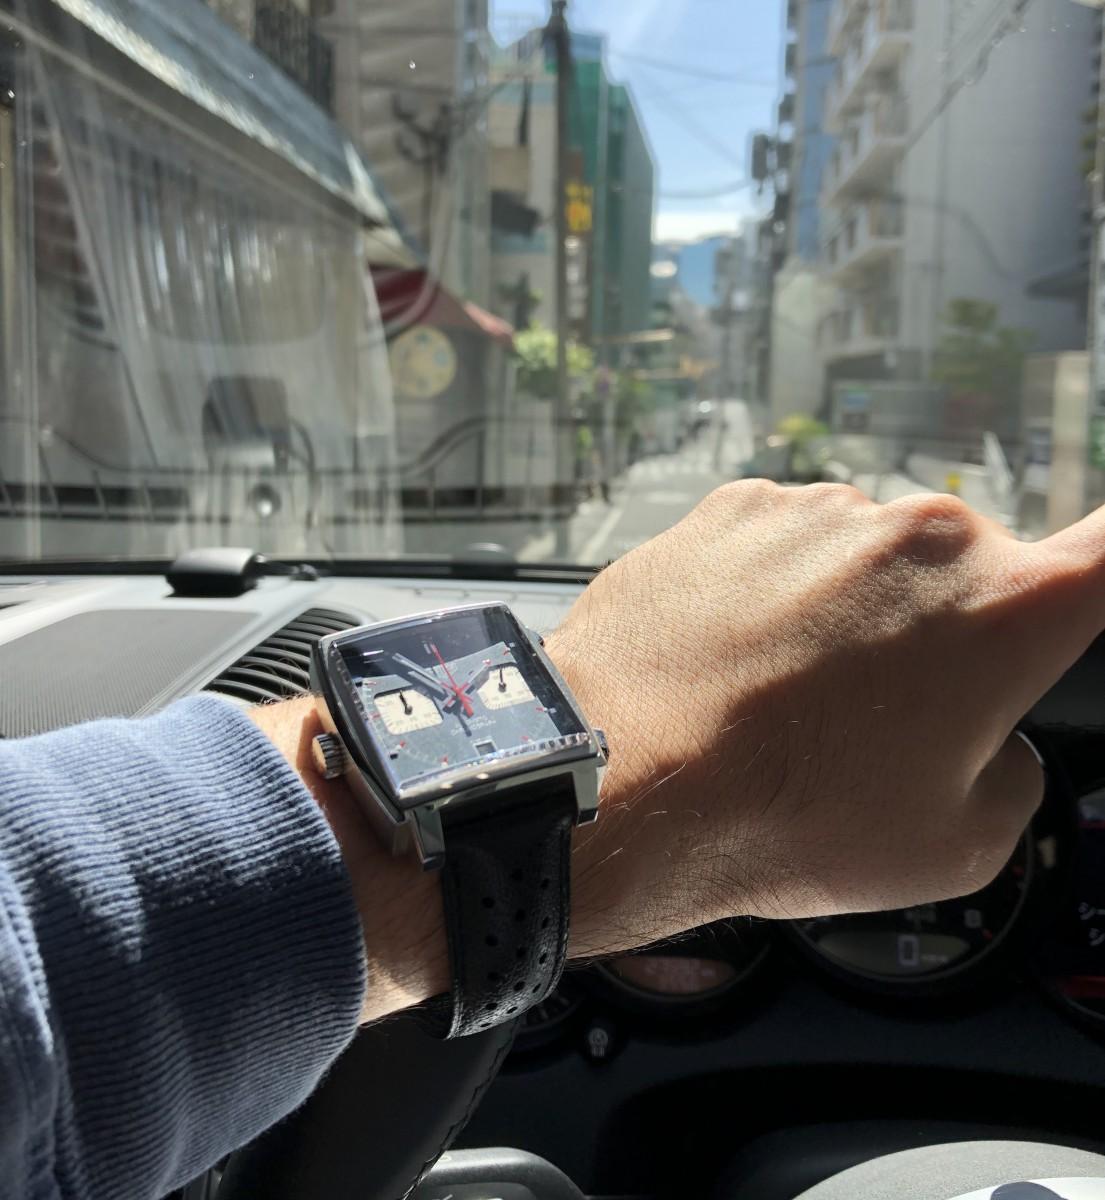 IMG_5664 モナコ、サントス、レベルソ。角型時計に悩める皆様へ、それぞれスタイルが全く違います!|関口 優